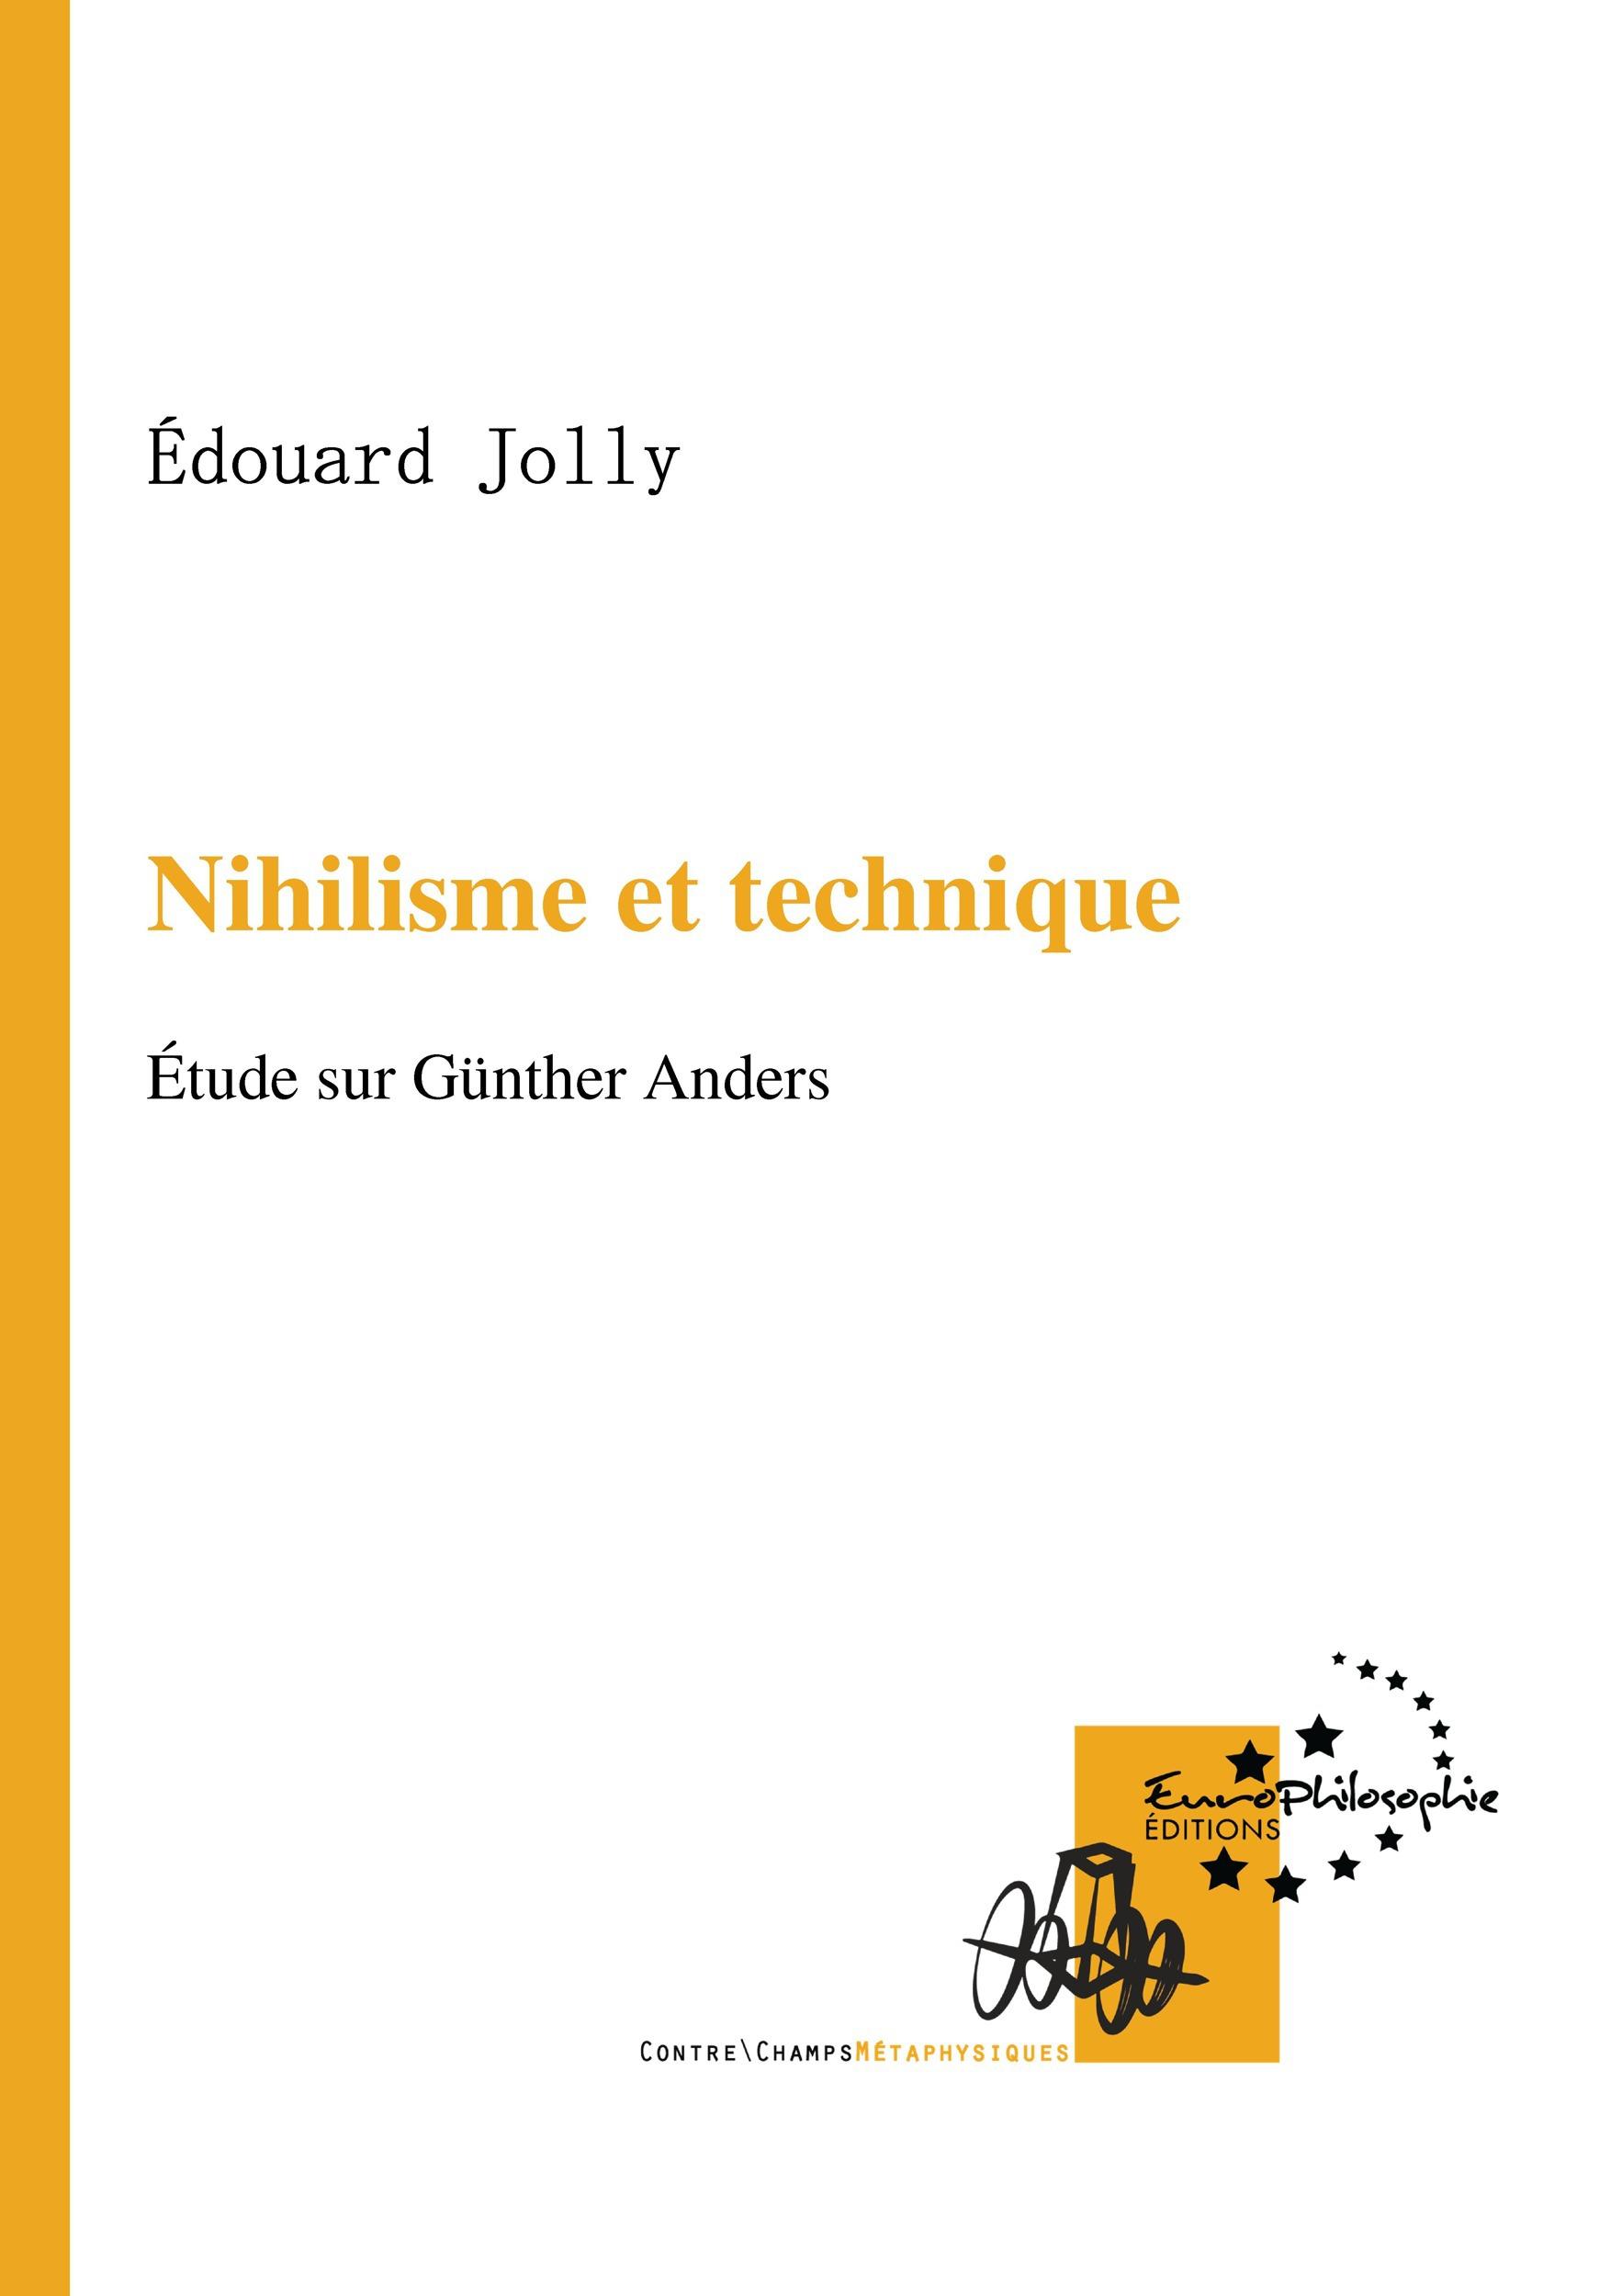 Nihilisme et technique